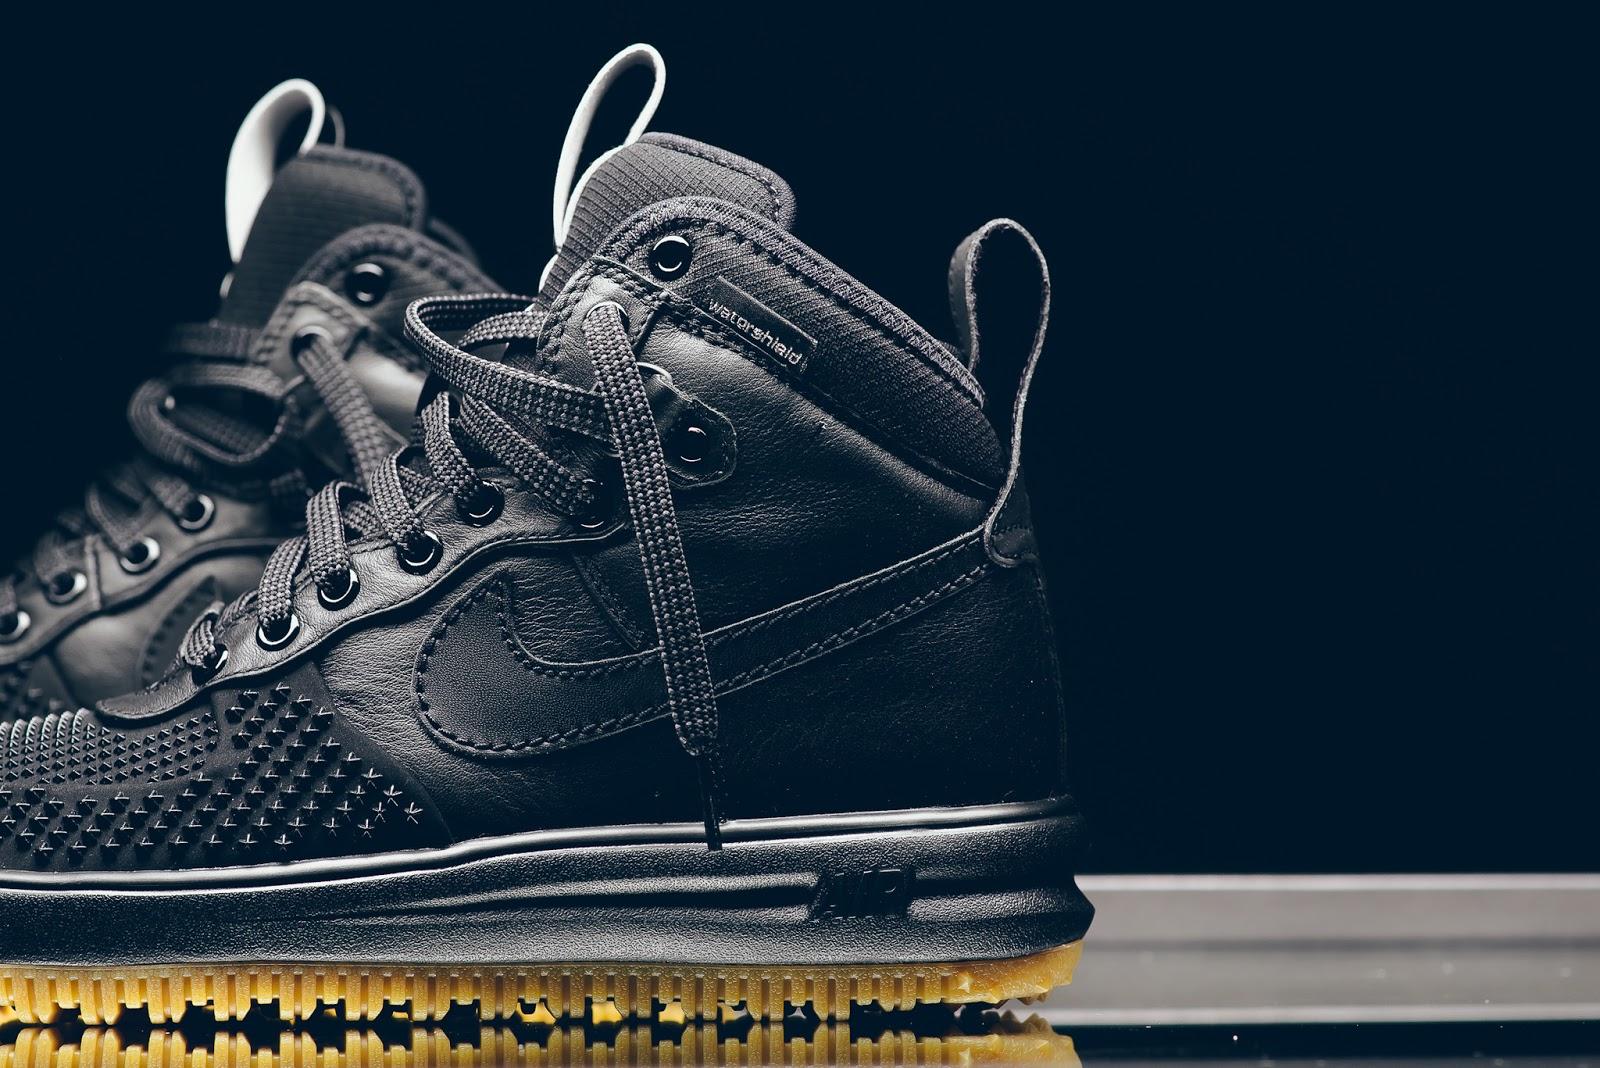 Nike Lunar Force 1 Duckboot - Black/Gum.